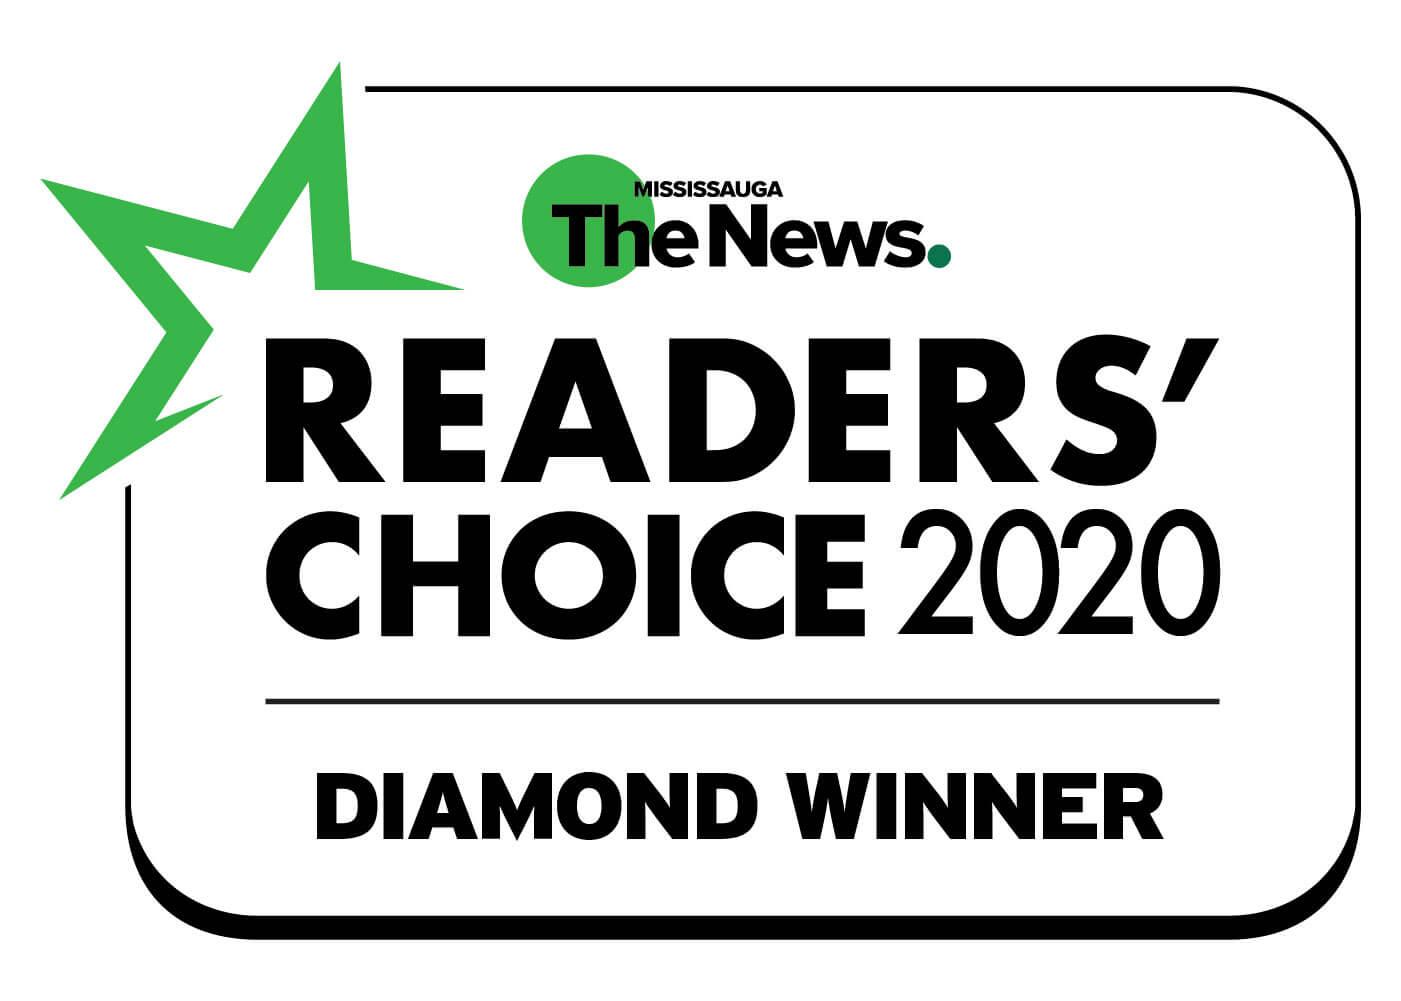 MN RCA Dimond Winner